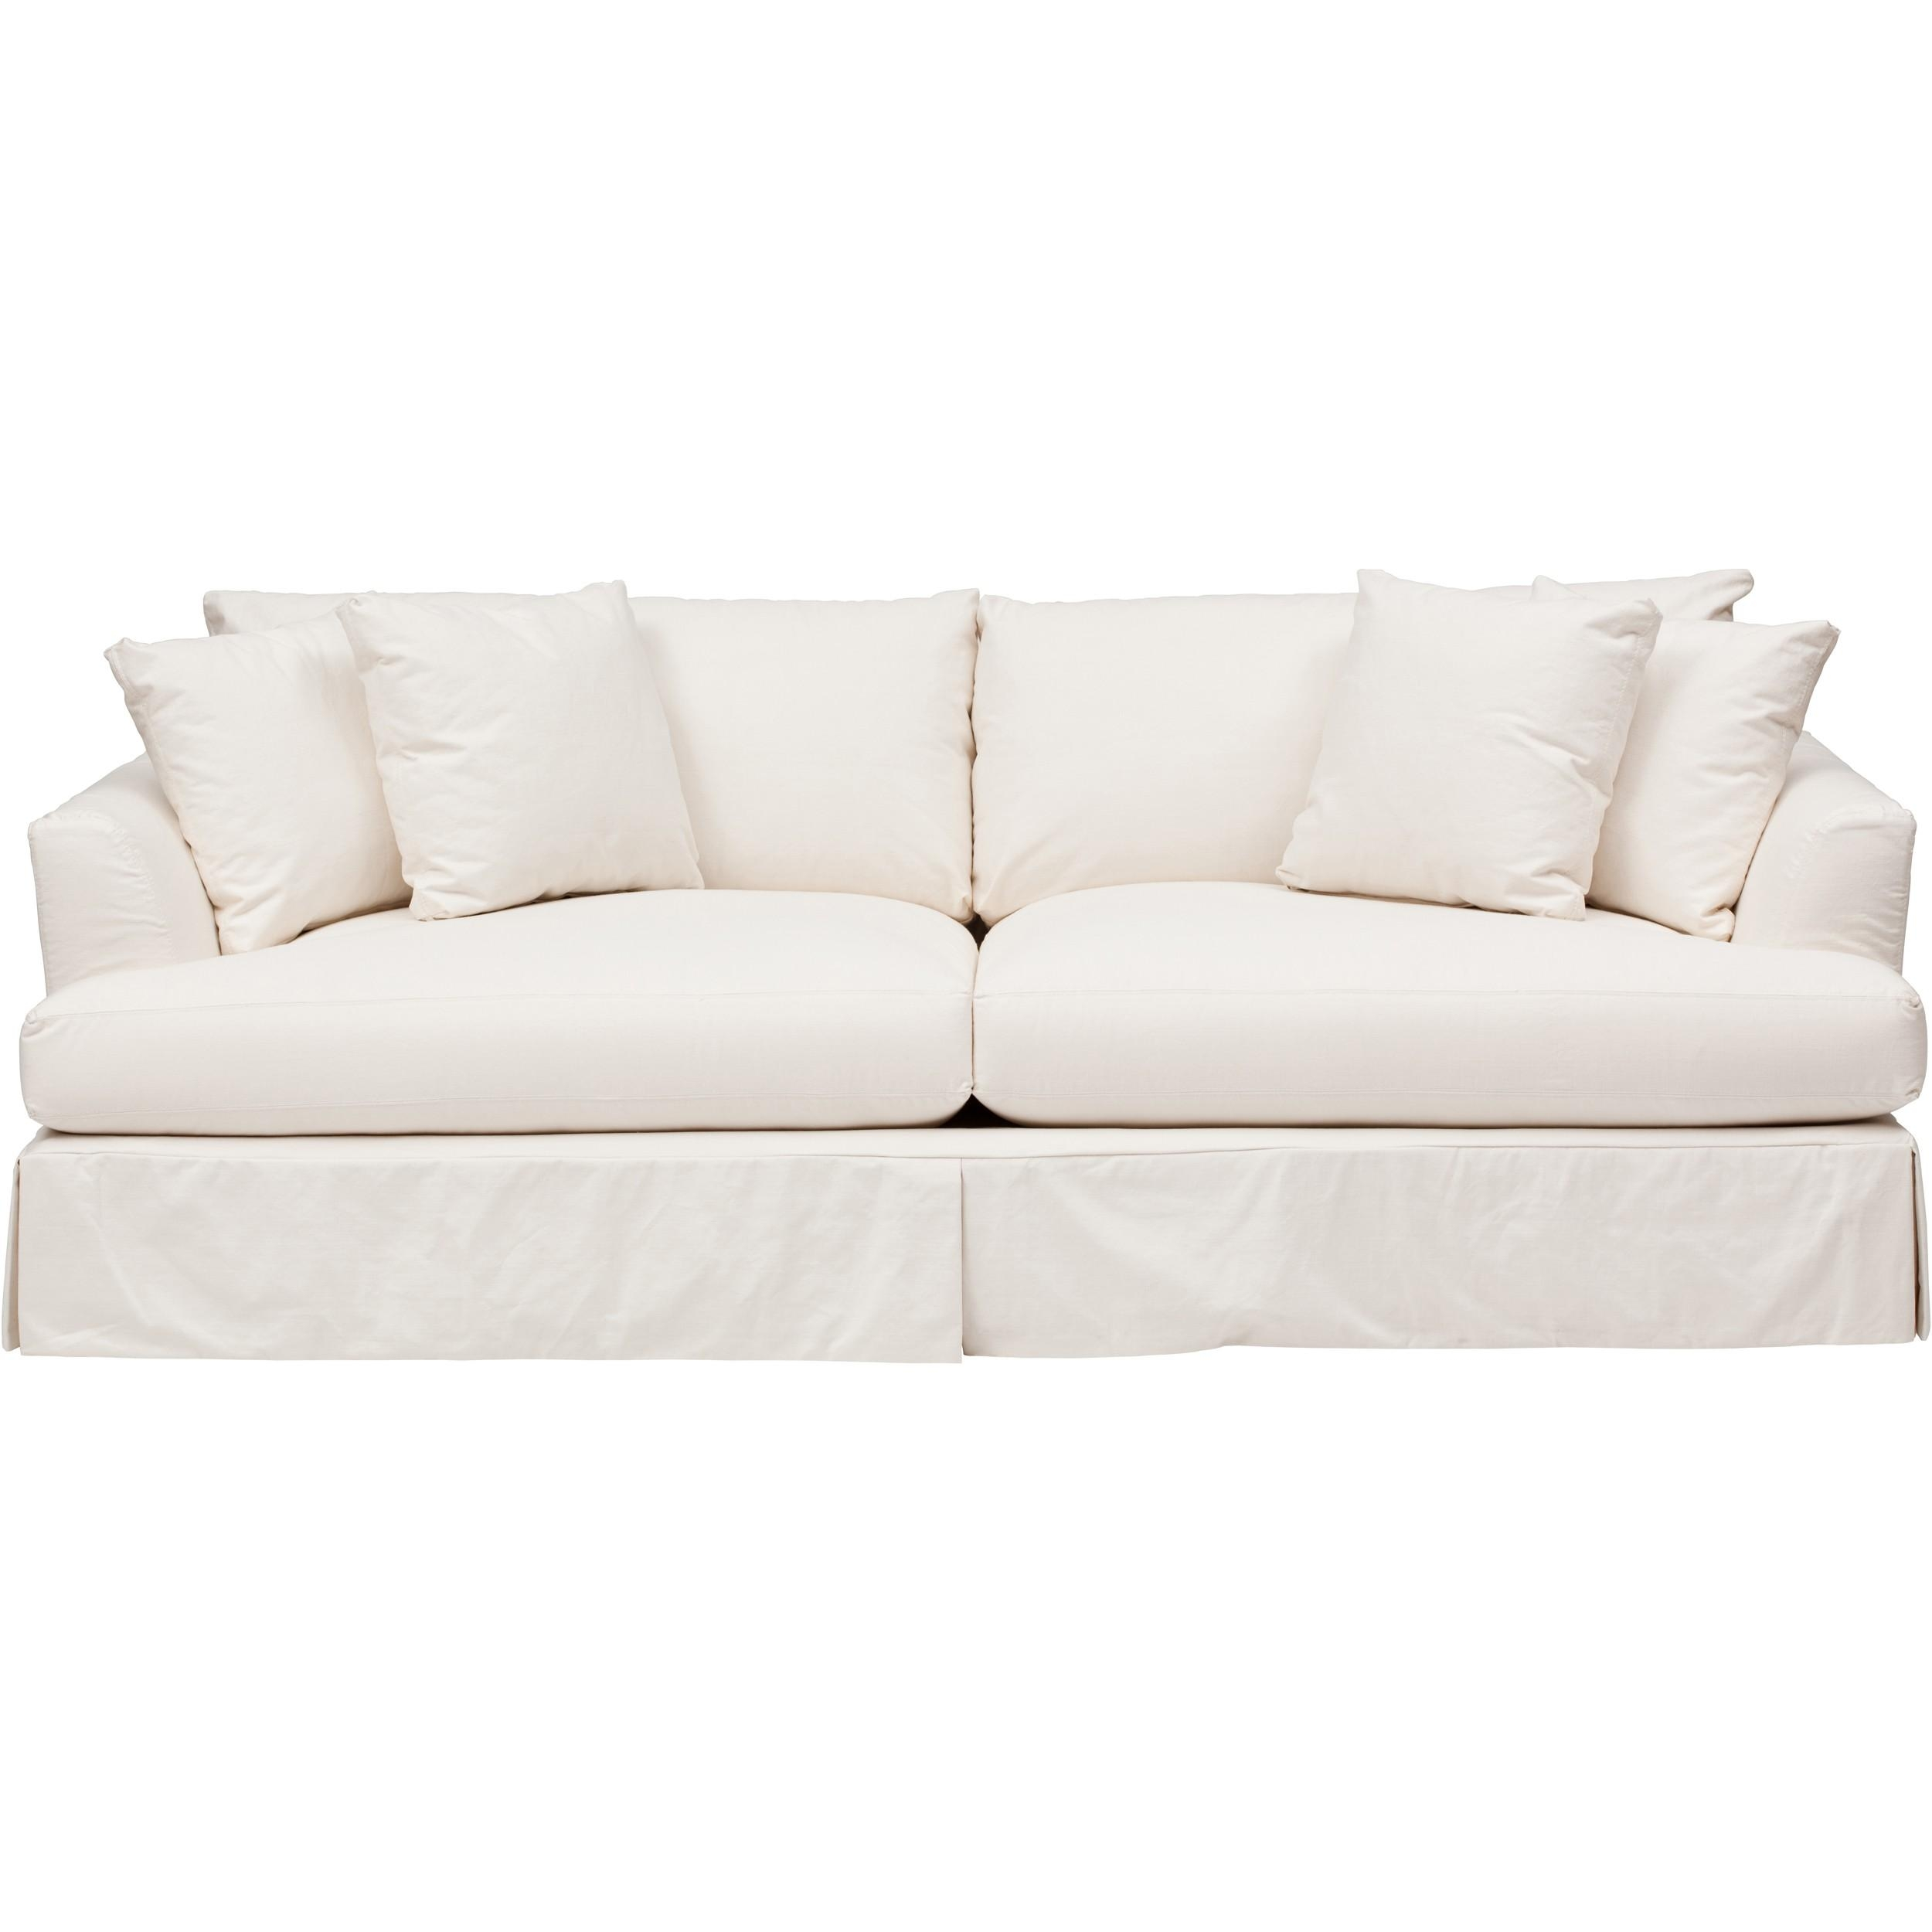 Fresh Free Leather Sofa Loveseat Slipcovers #21136 With Sofa Loveseat Slipcovers (Image 5 of 25)